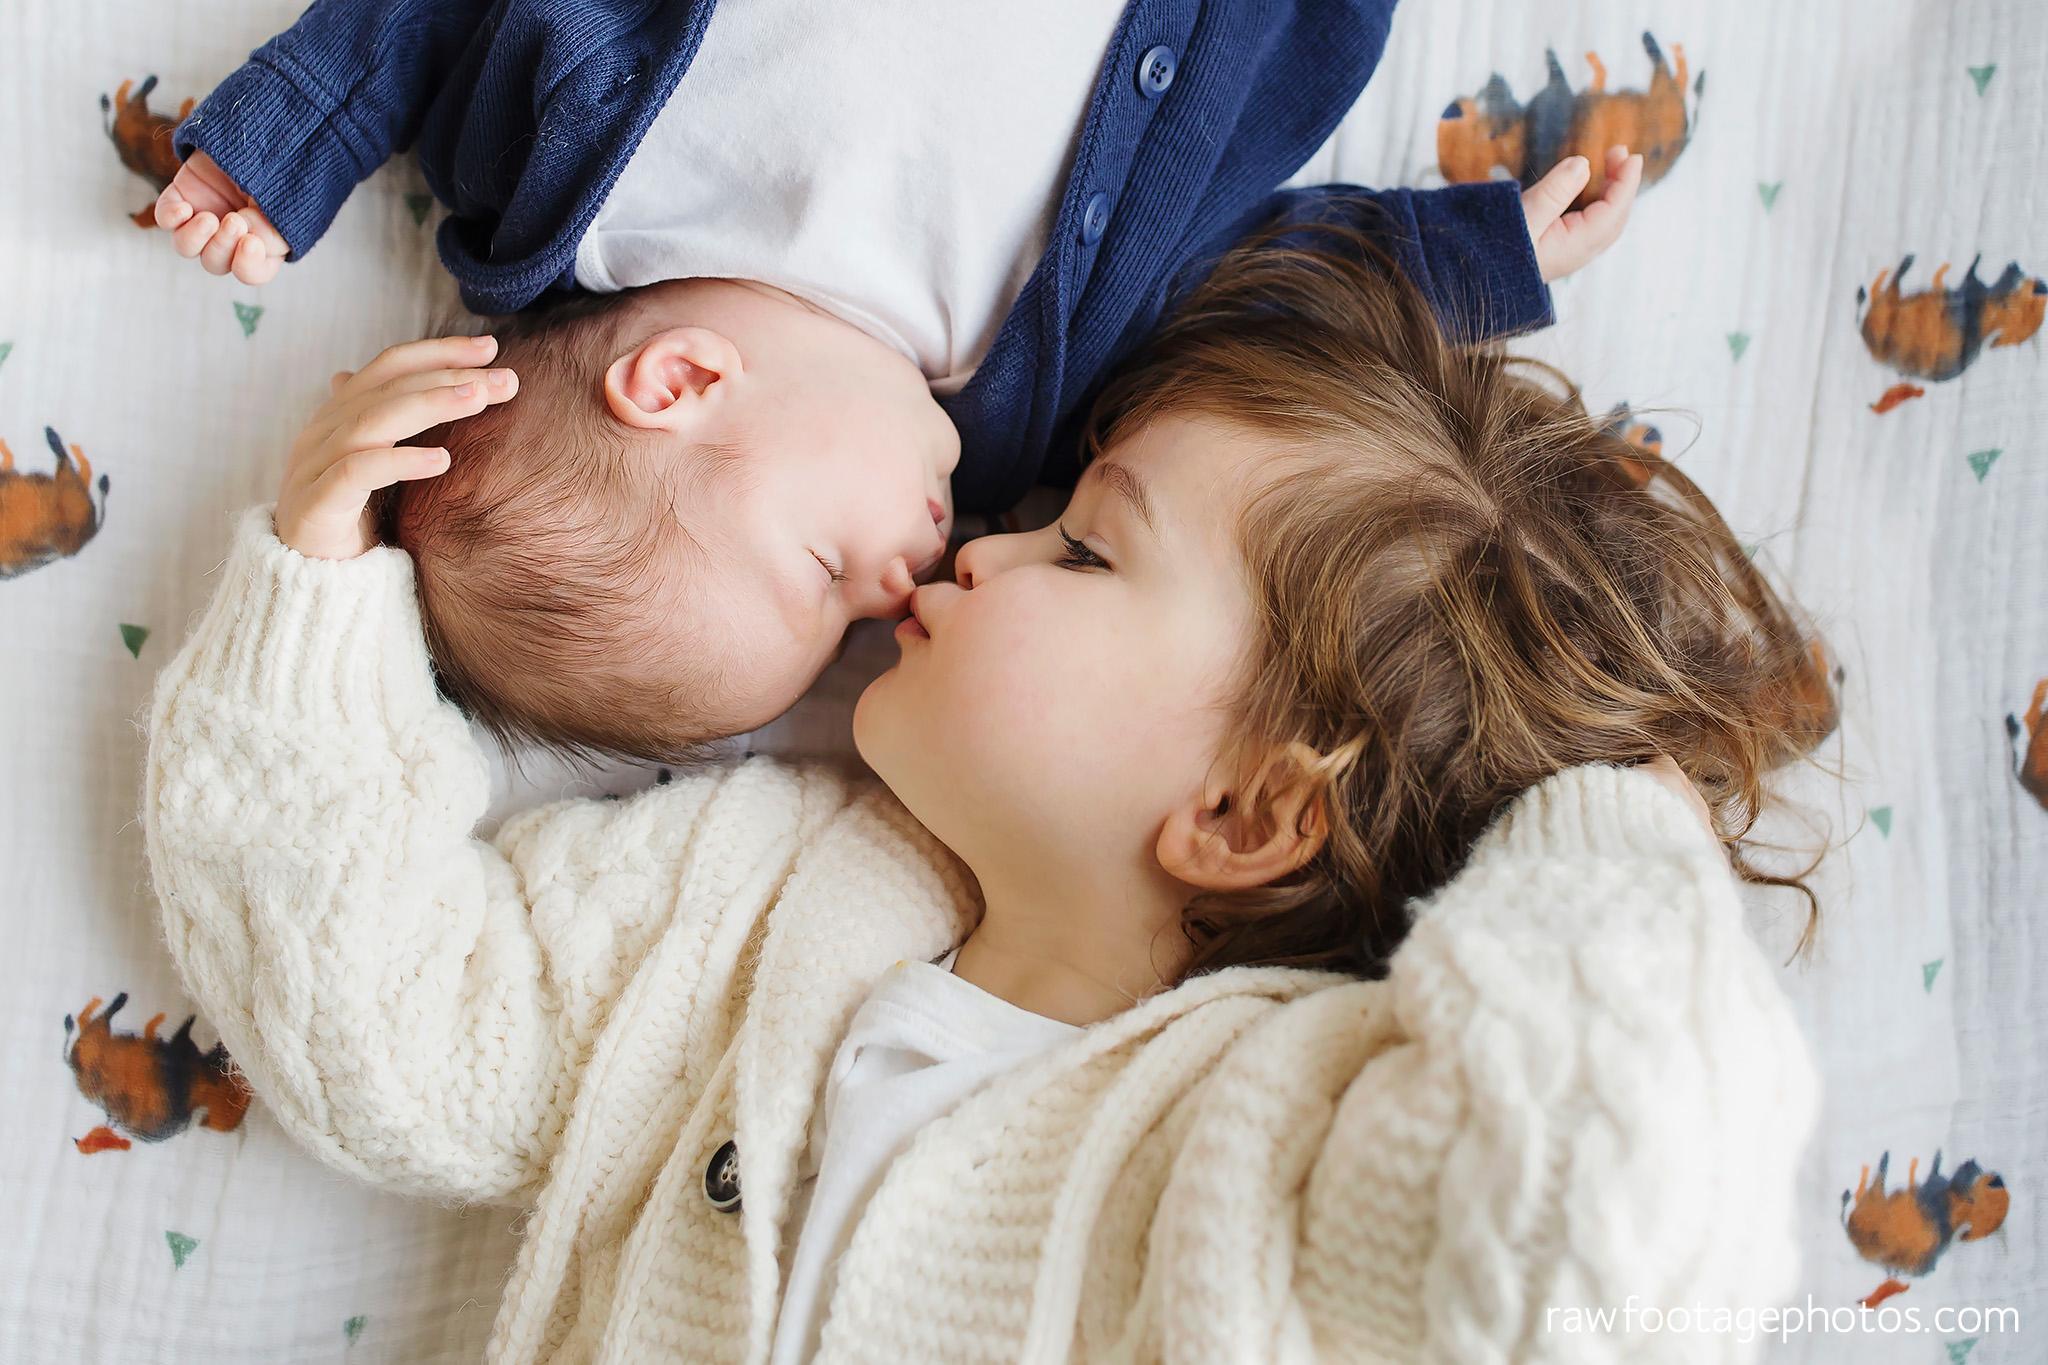 london_ontario_newborn_lifestyle_photographer-best_of_2018-raw_footage_photography013.jpg